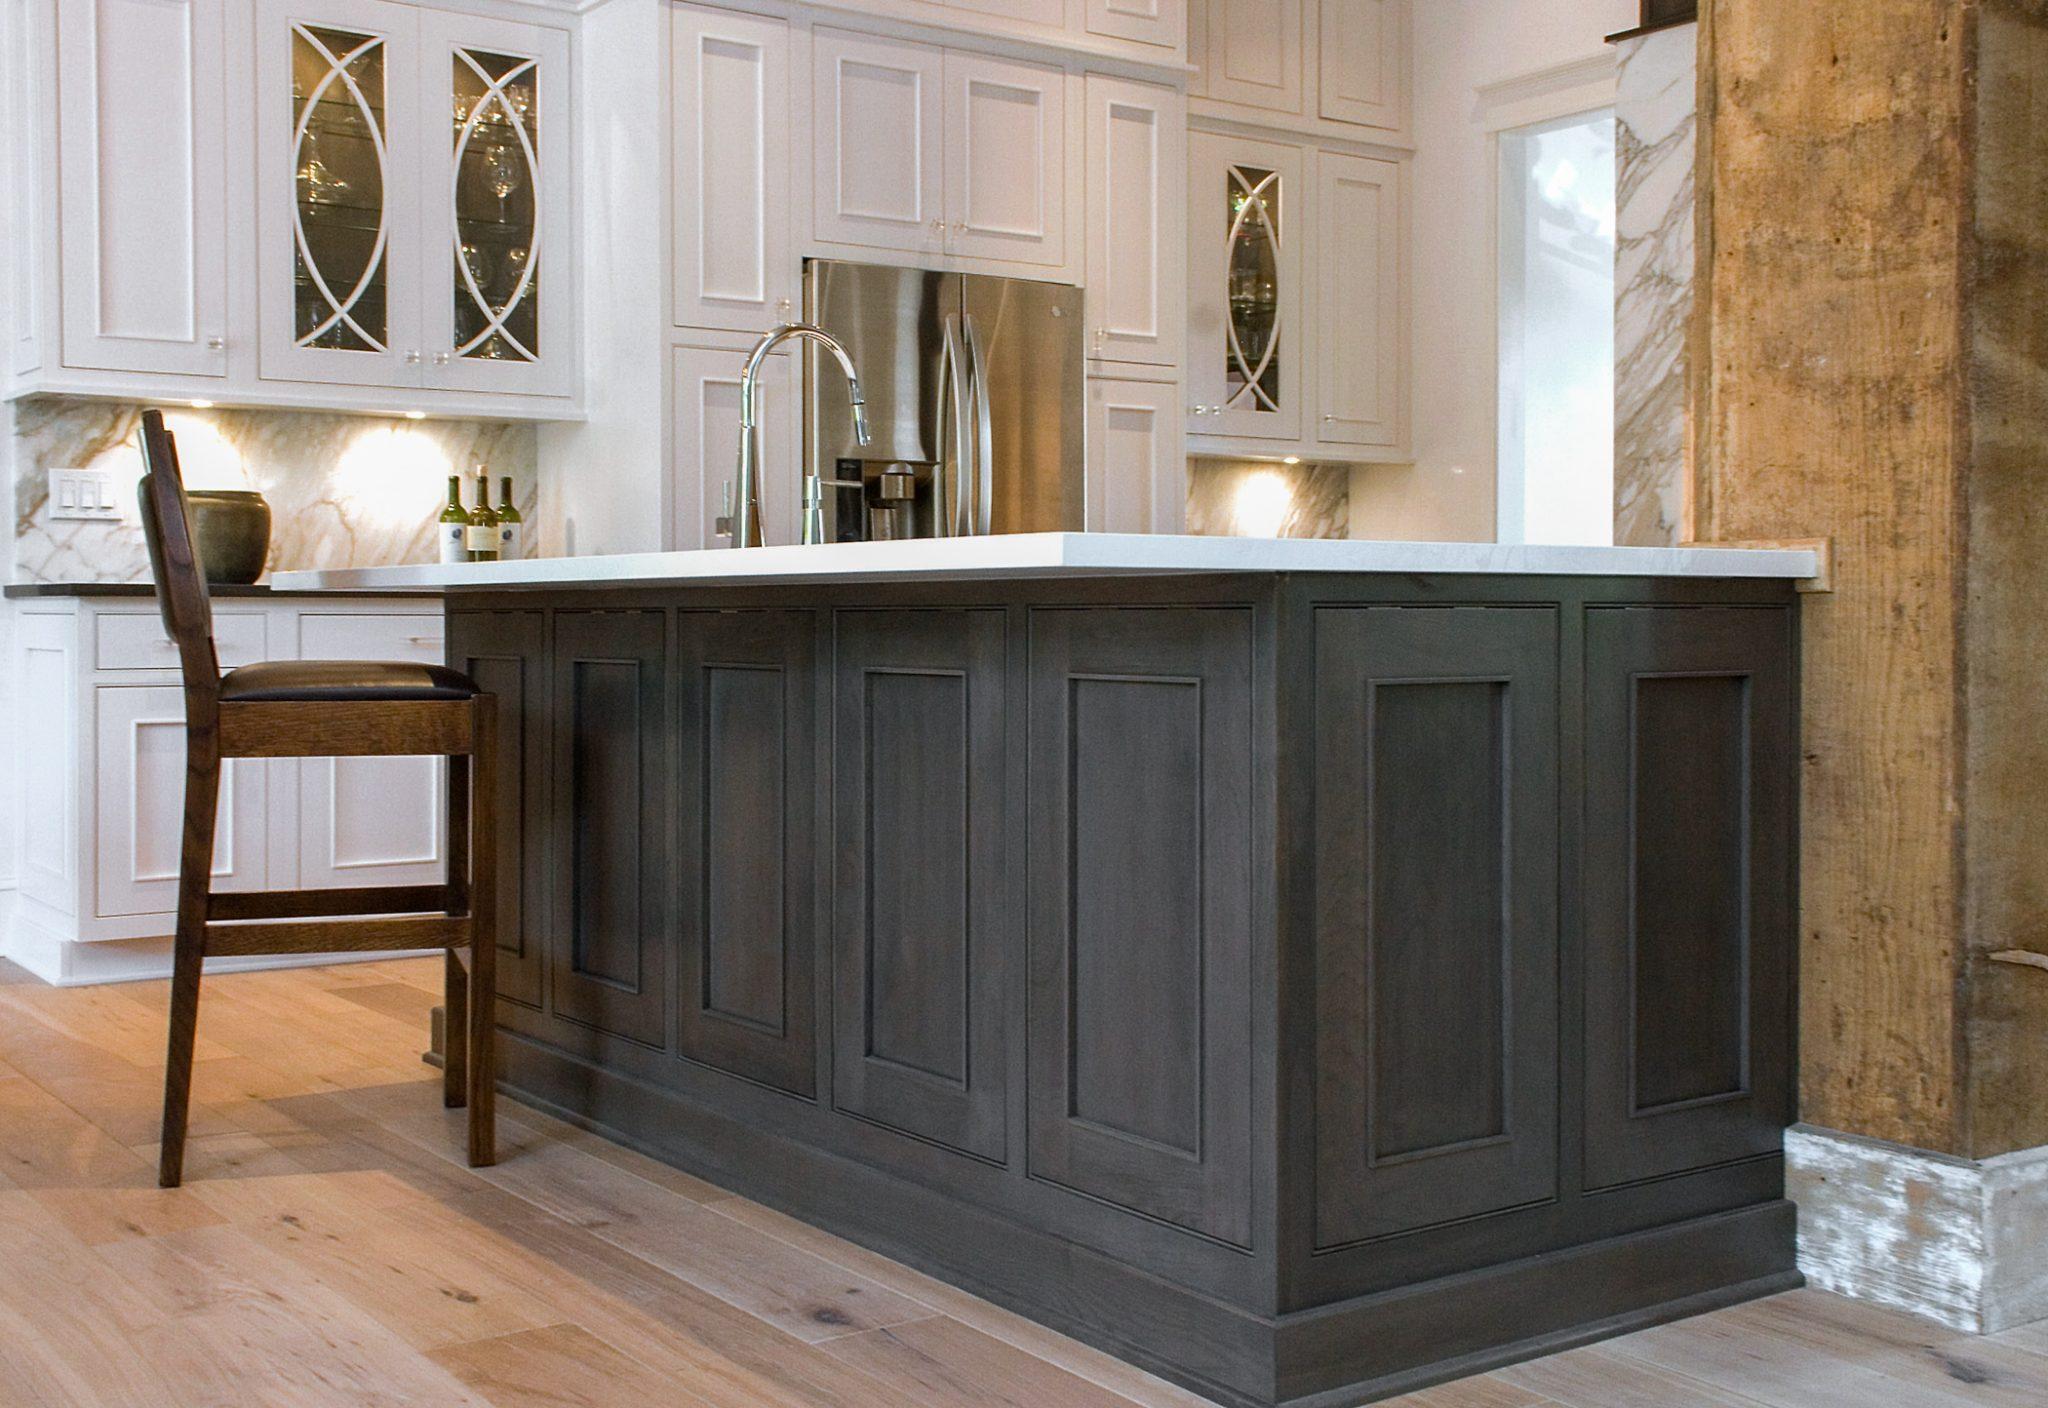 kitchens etc kitchen design on 30a 11 Kitchens Etc 30A